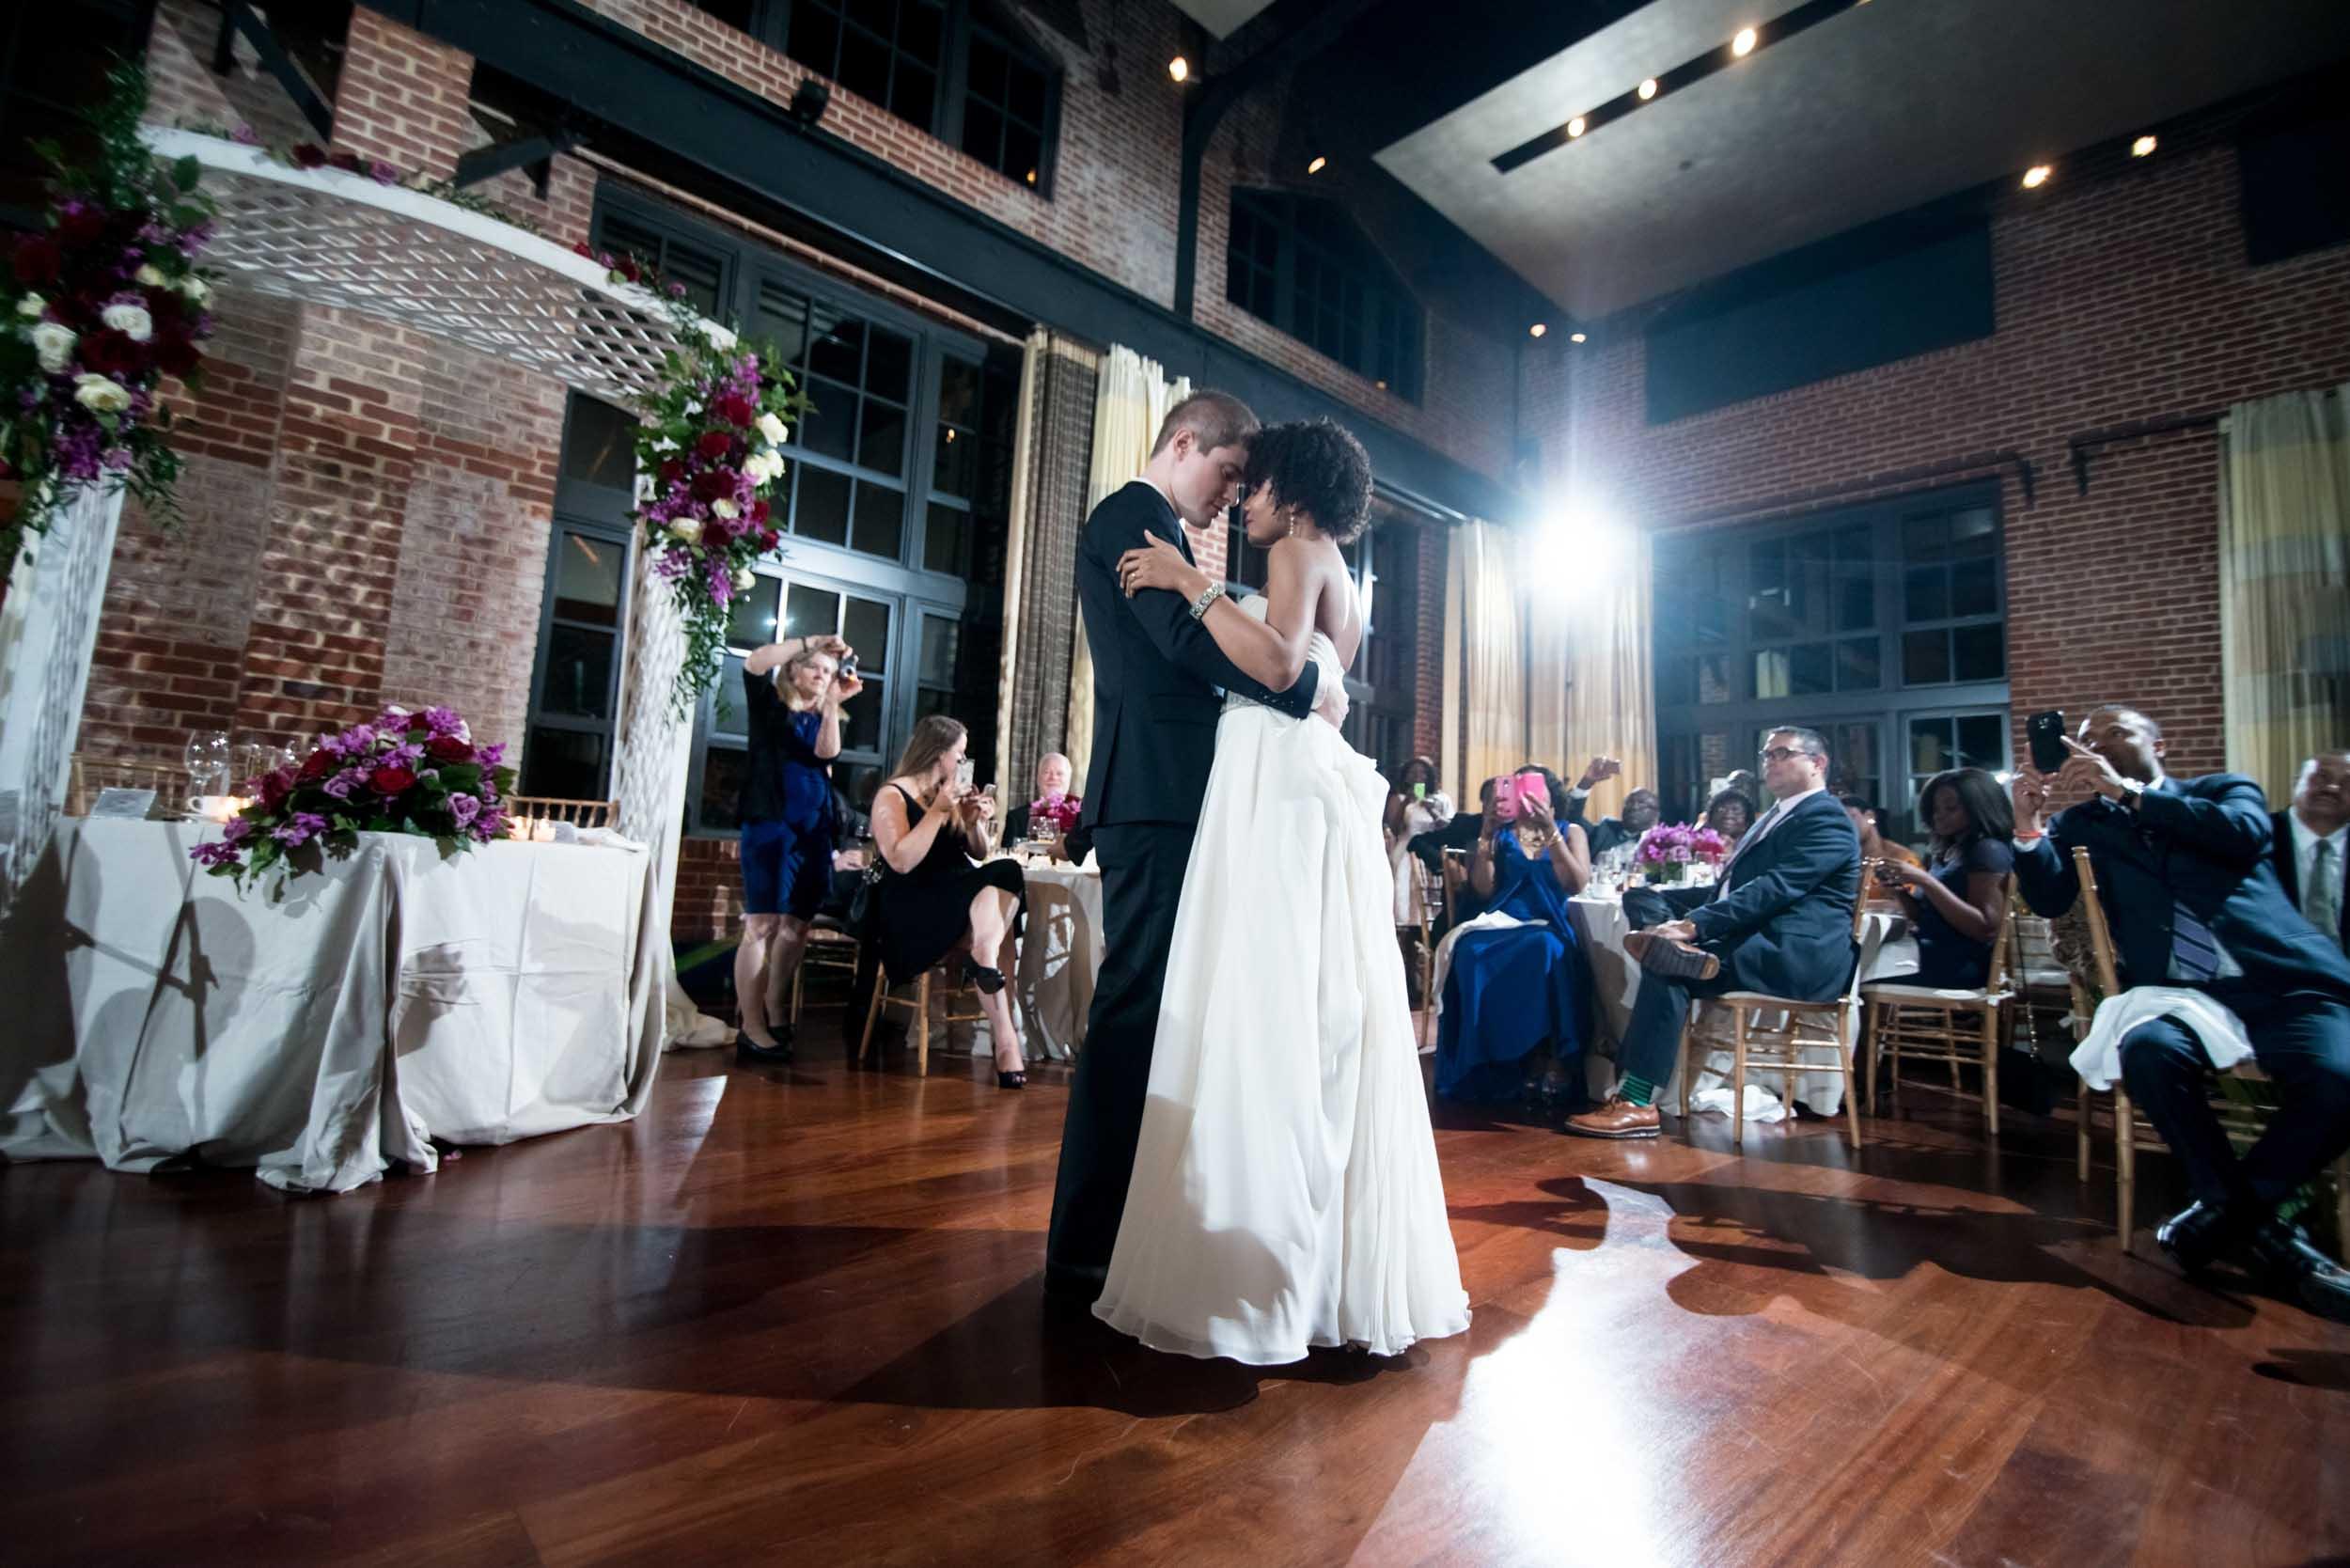 dc+metro+wedding+photographer+vadym+guliuk+photography+wedding+first+dance-2022.jpg